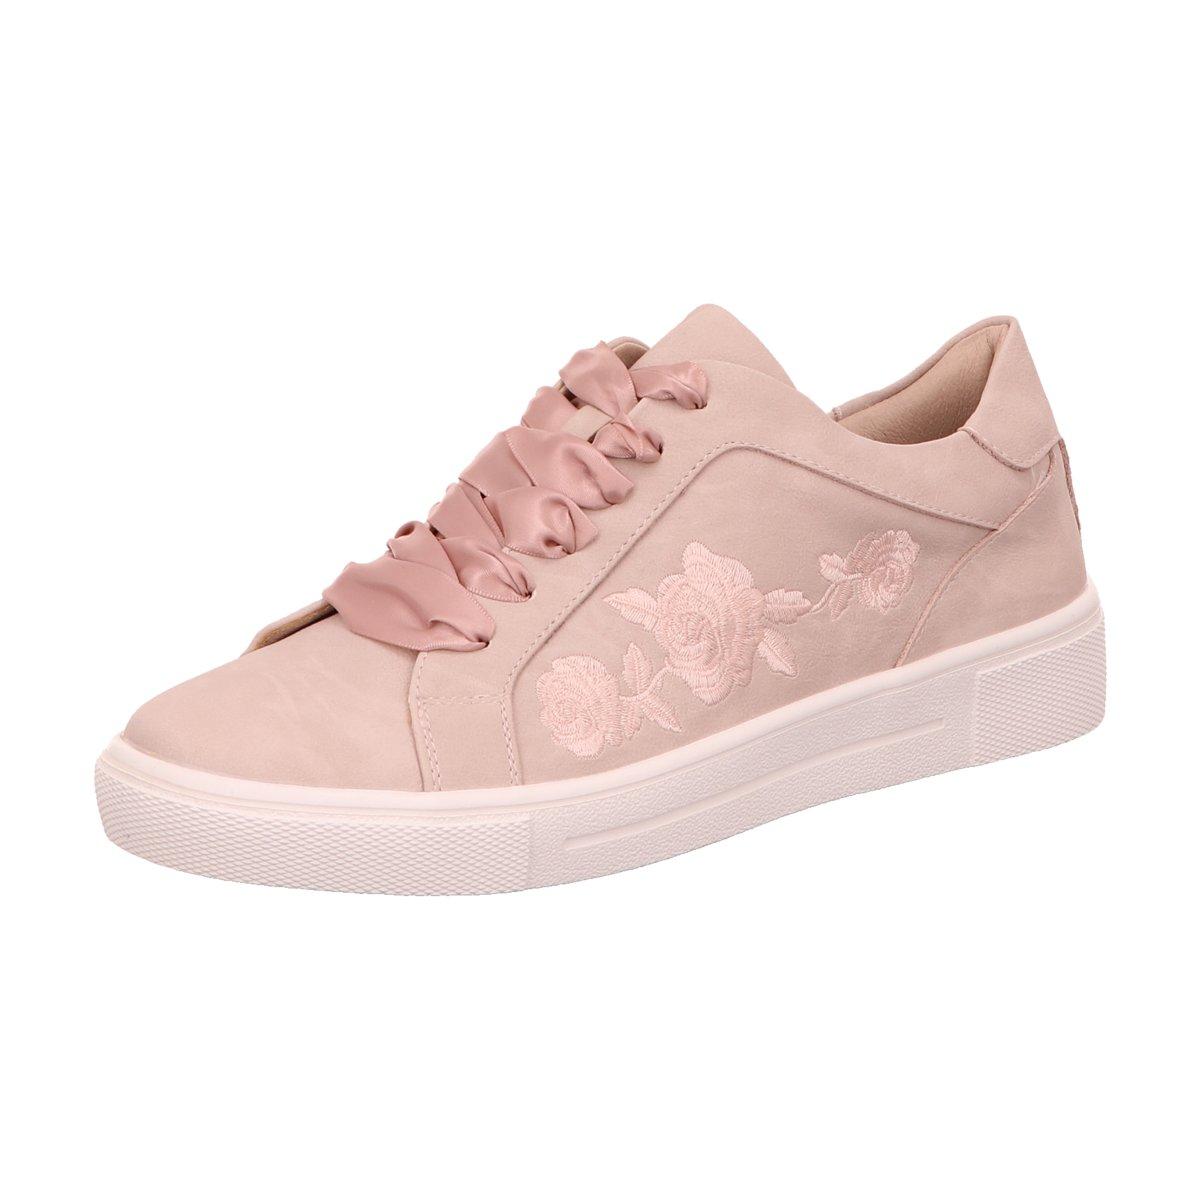 Details zu Rieker Damen Sneaker N9112 31 Rieker N9112 31 rosa 594580